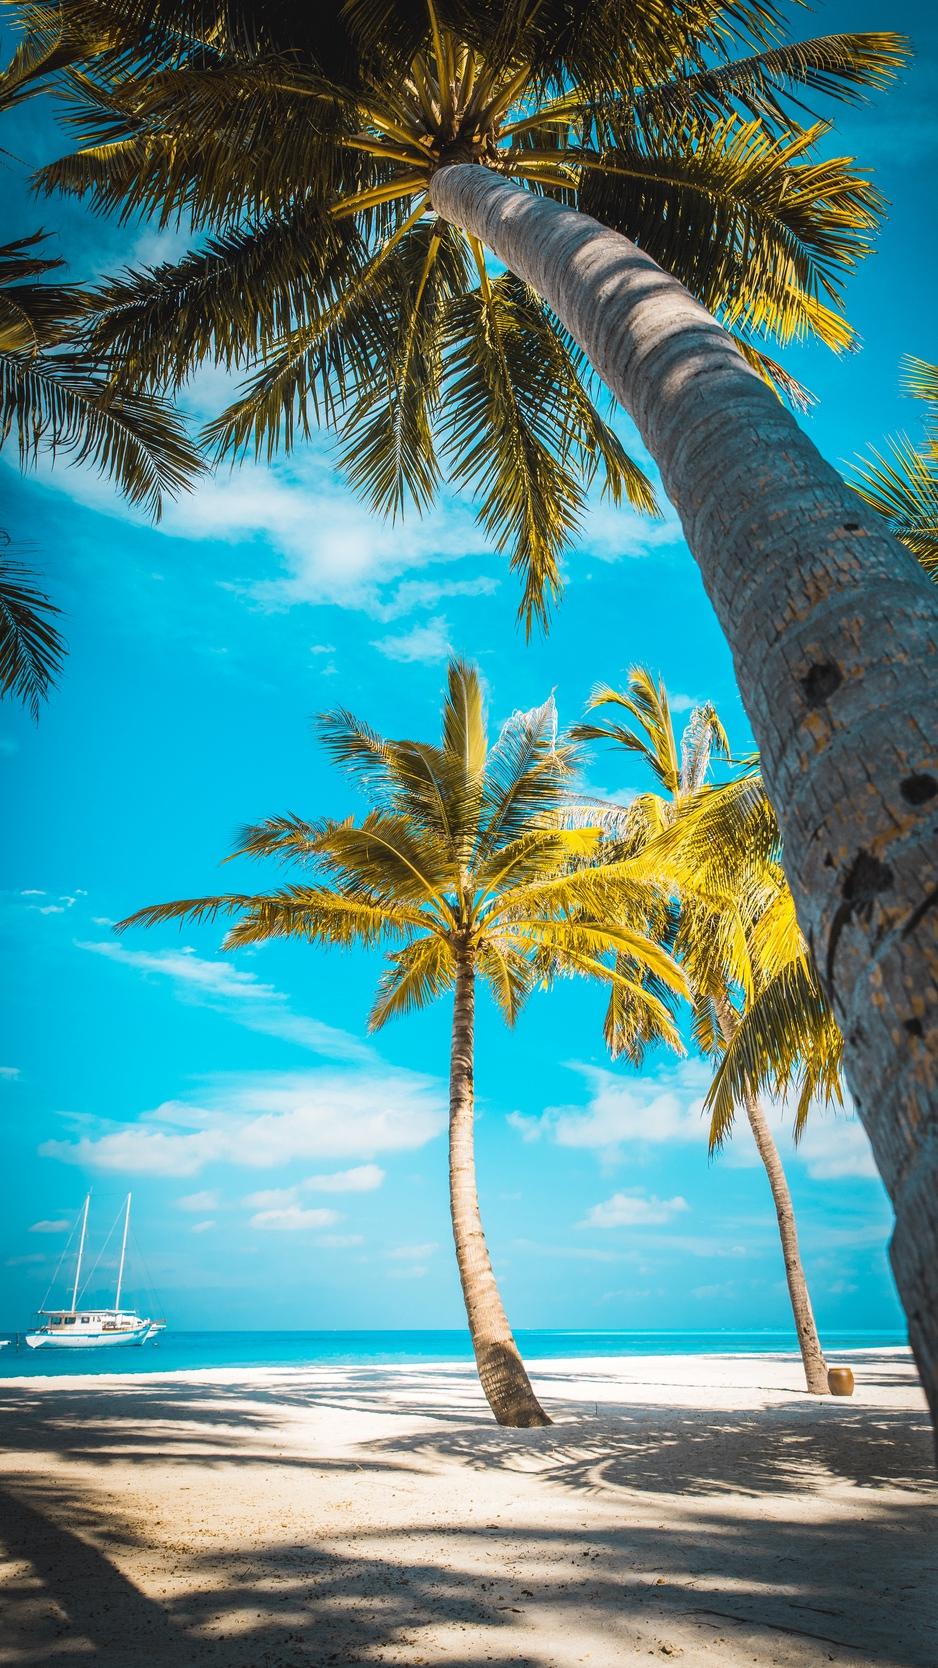 Wallpaper Palm Trees, Beach, Sand, Tropics, Paradise - Iphone Palm Tree Beach Background - HD Wallpaper